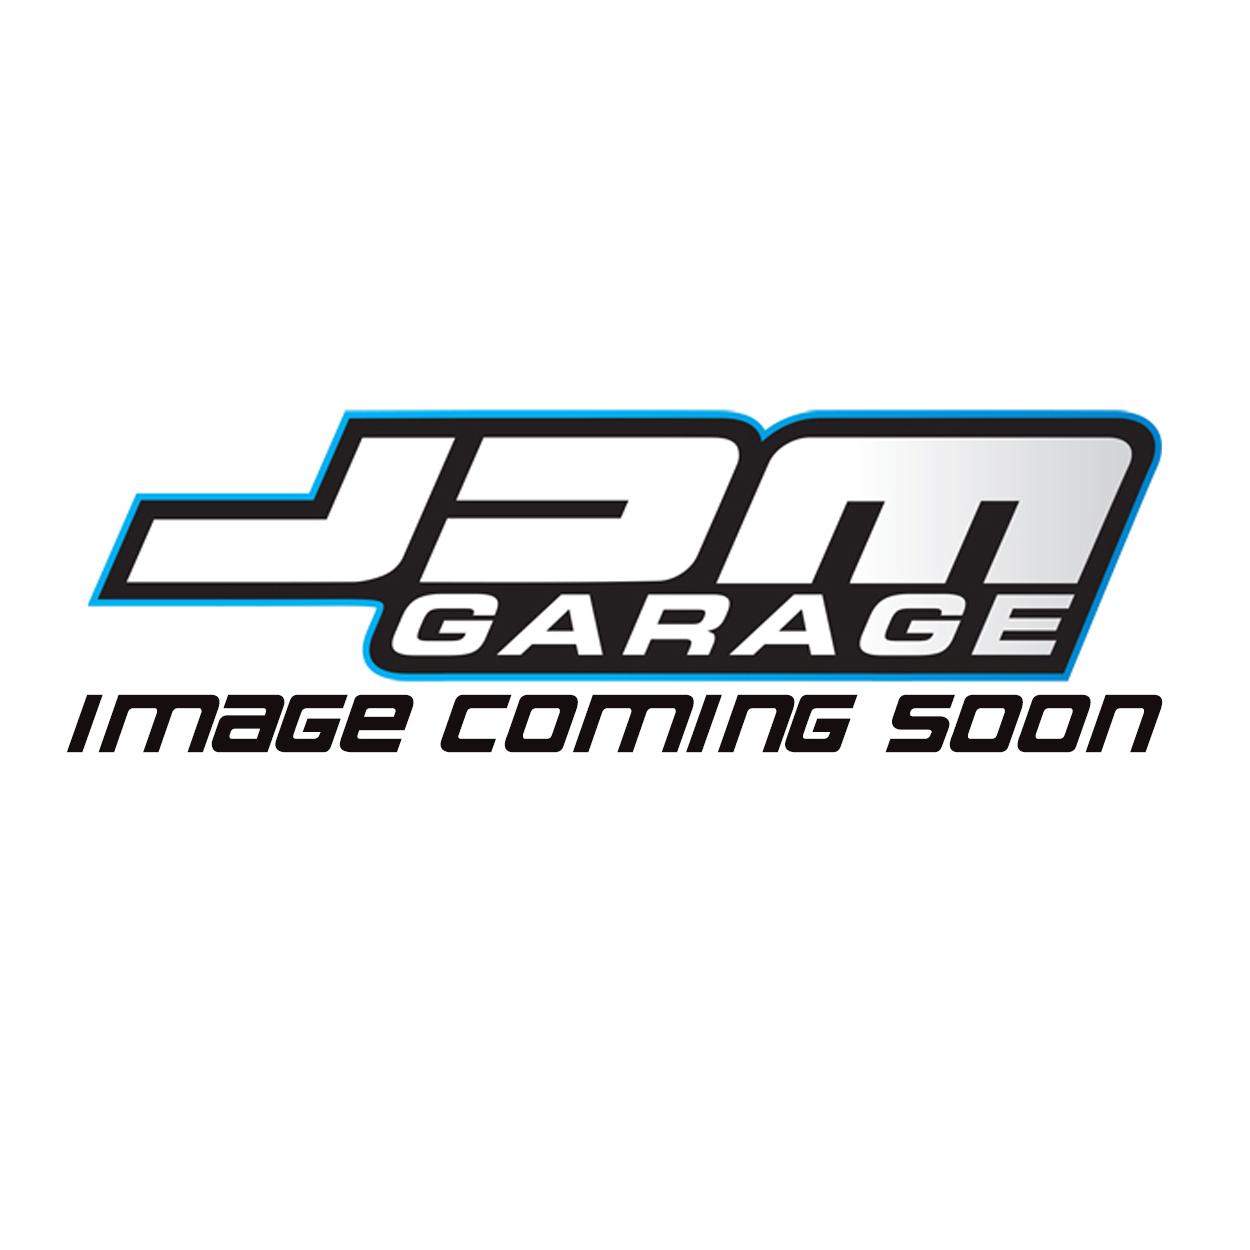 Genuine Nissan Rear Brake Pad Retaining Pin / Caliper Guide Pin Skyline R32 R33 GTST R34 GTT / Fairlady Z Z32 41217-43P00